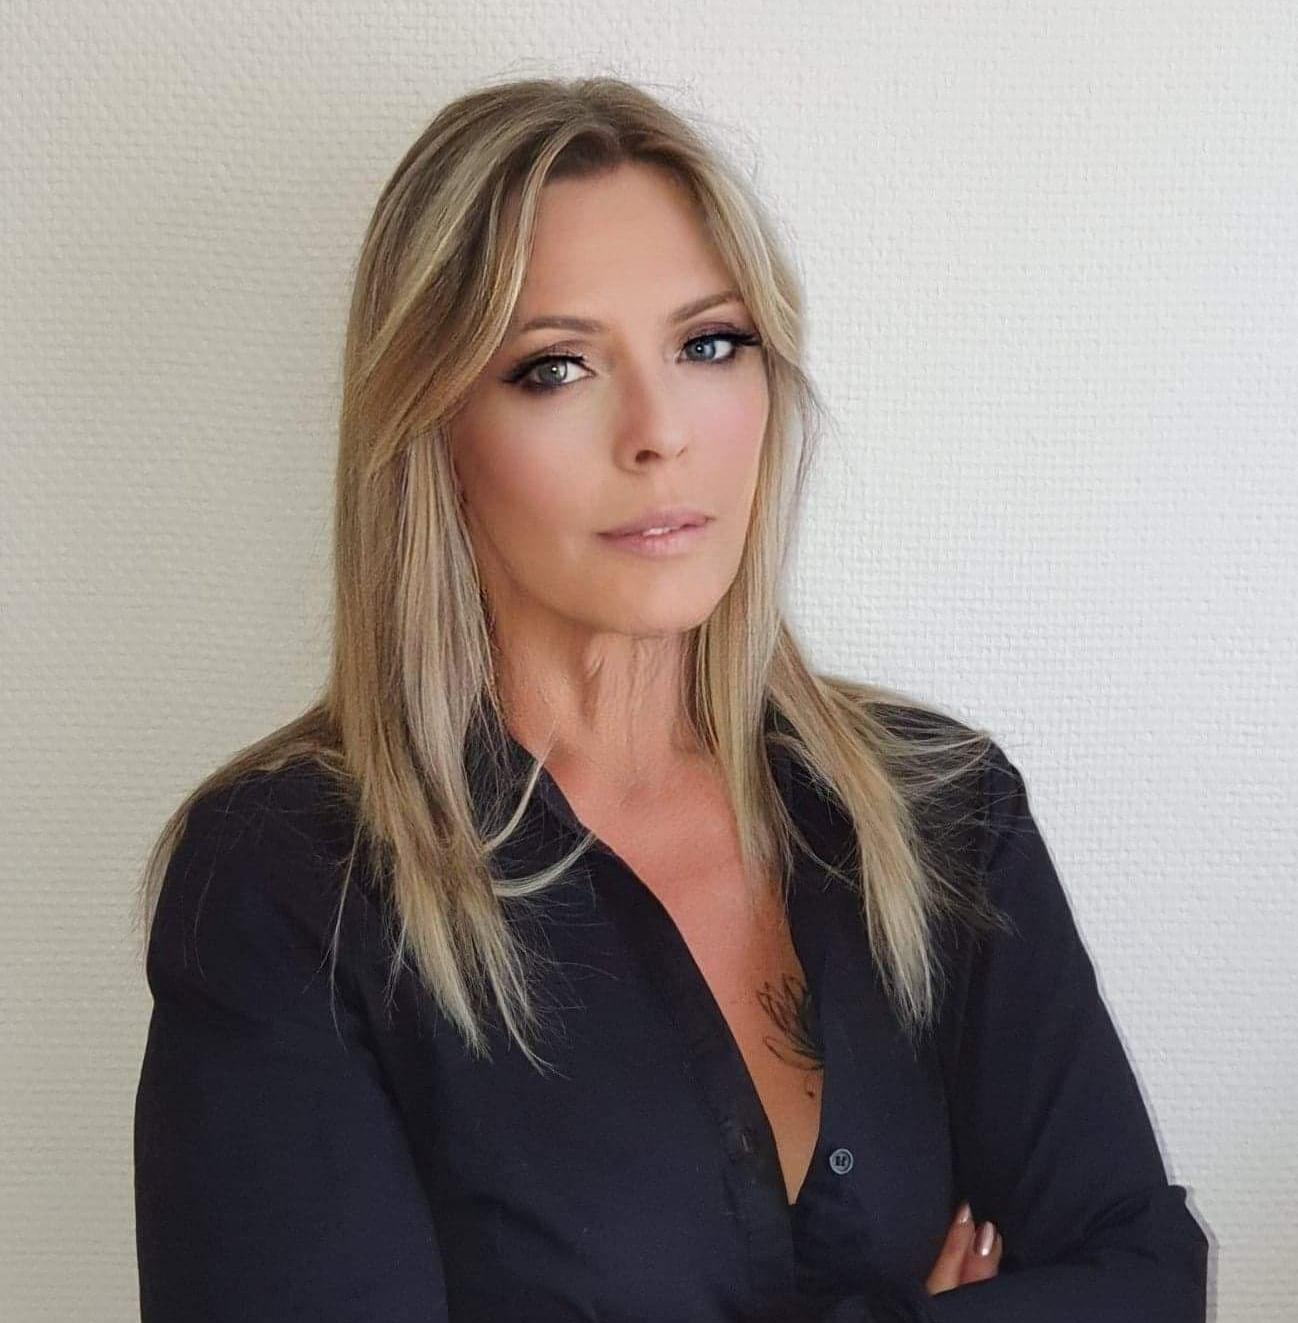 Corinne DUARTE